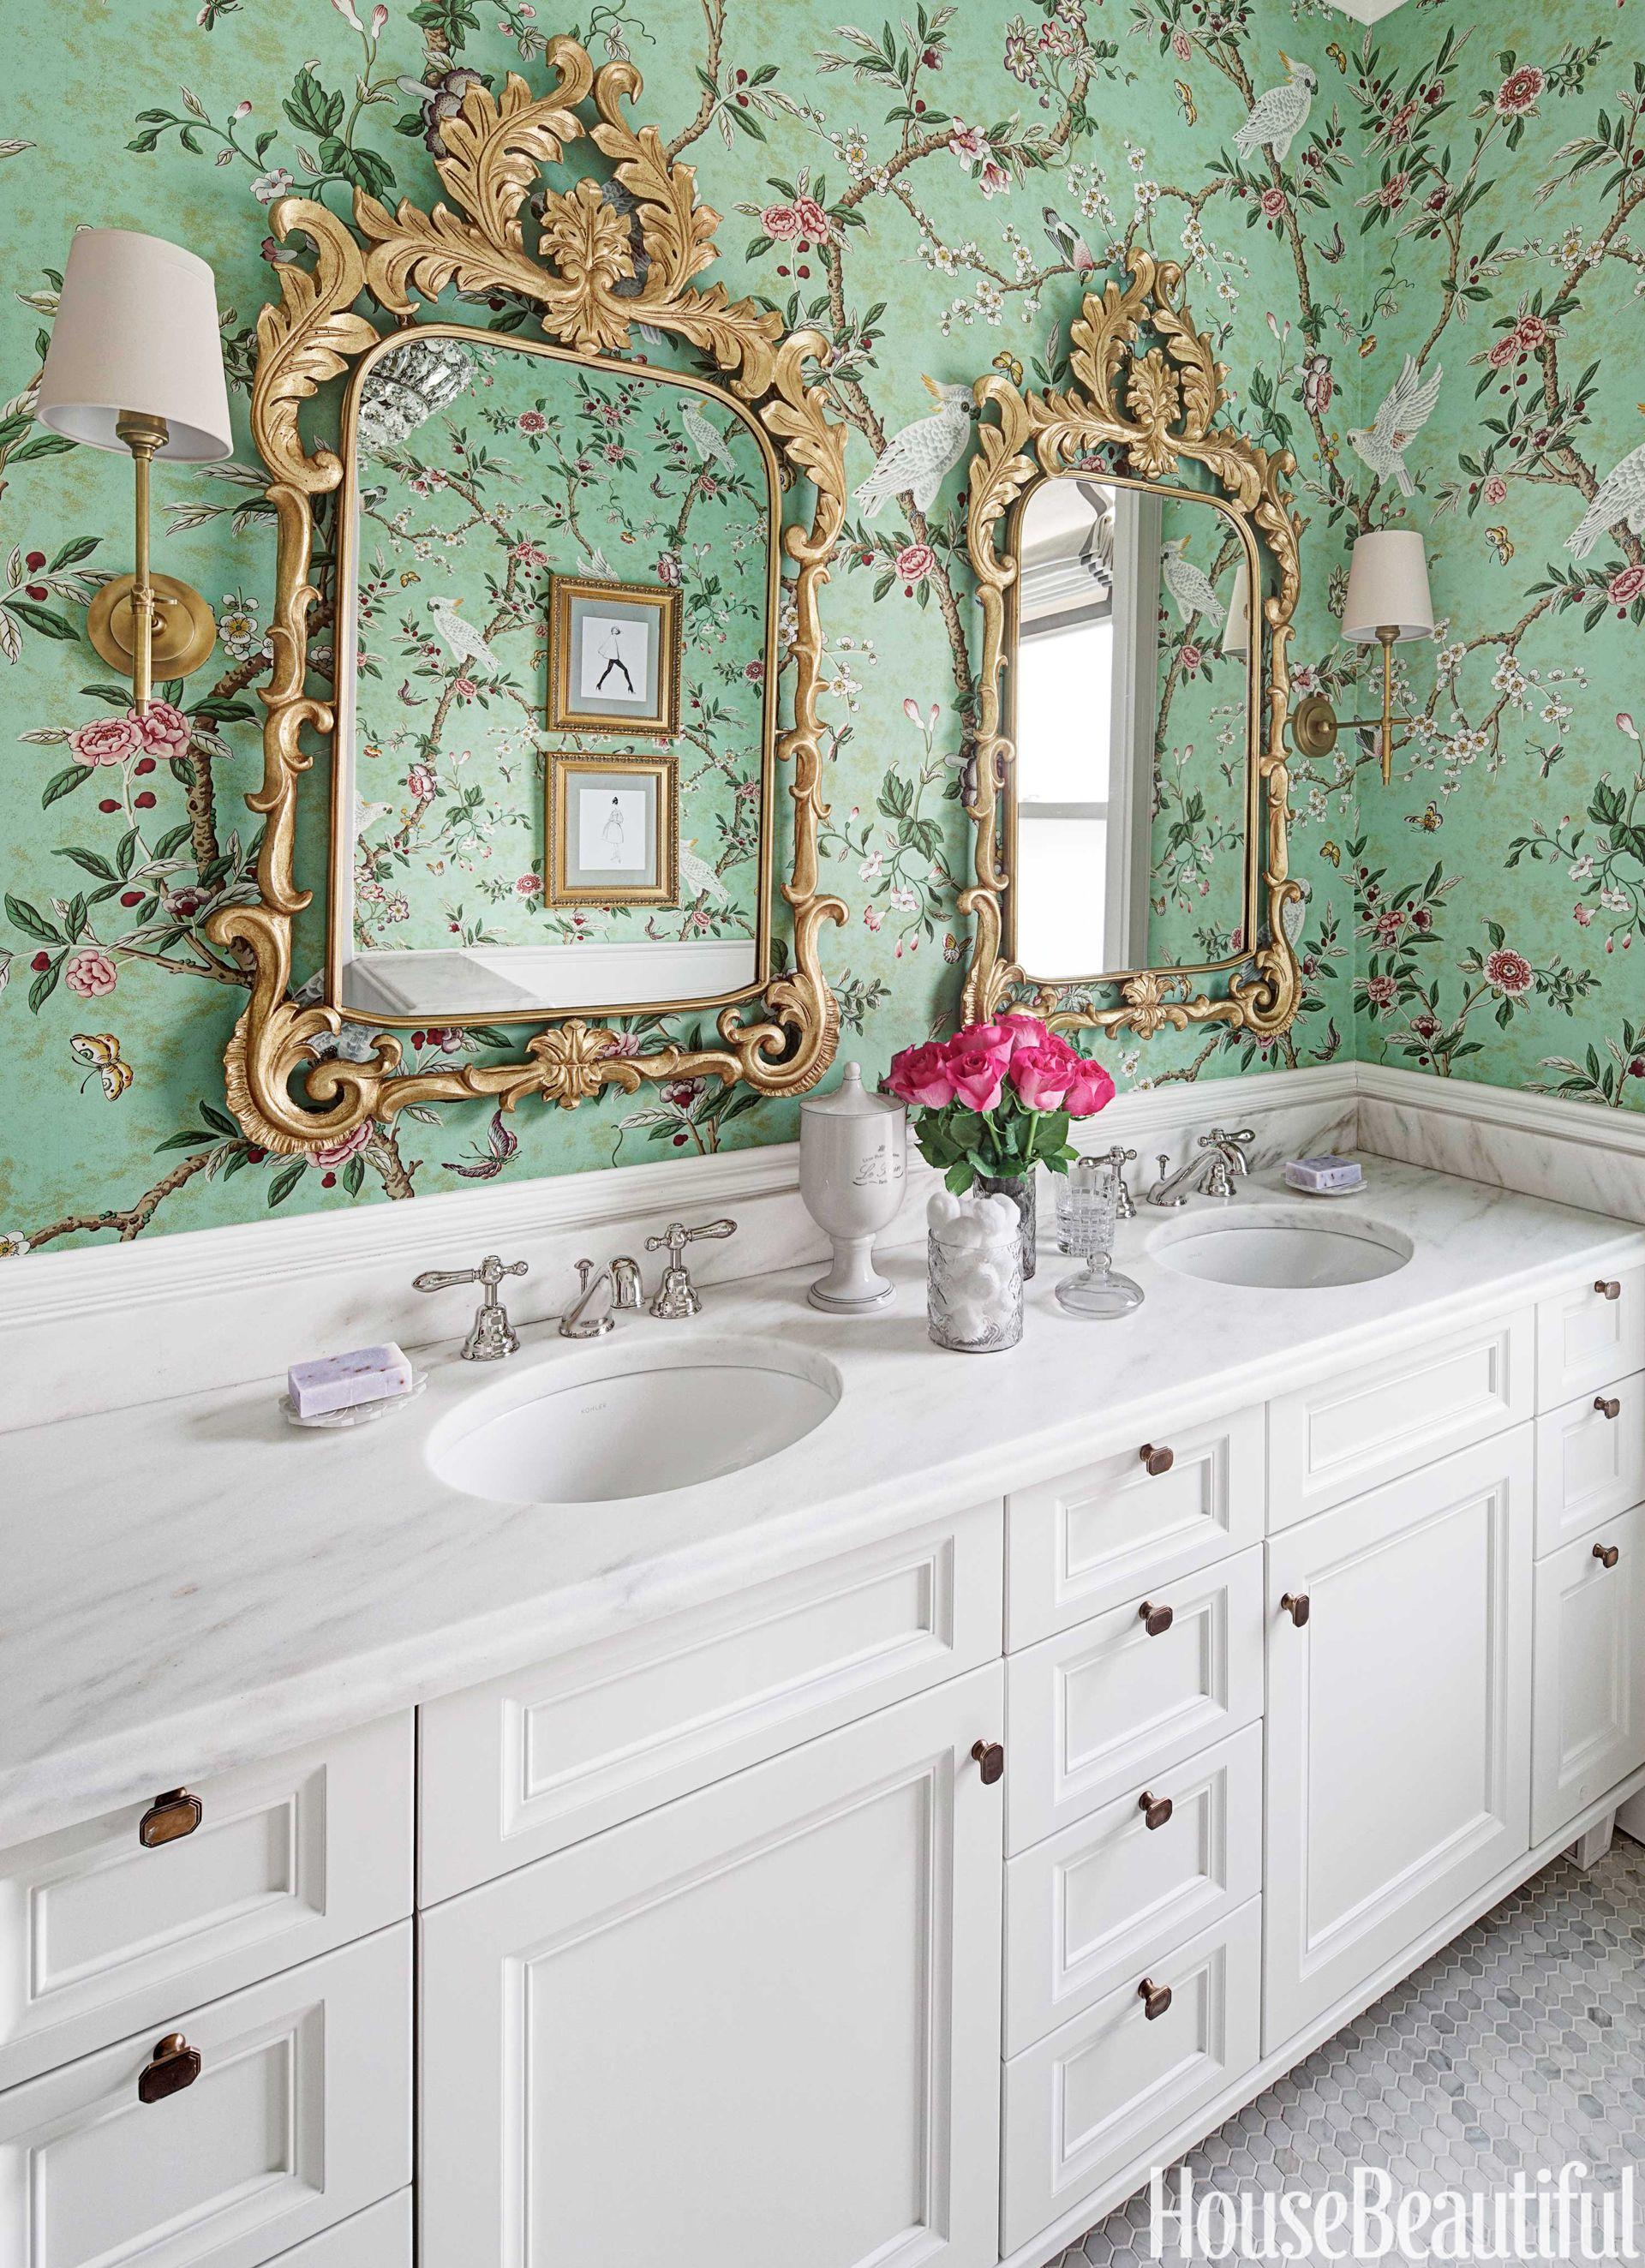 Young Girls Glamorous Bathroom - Kids Bathroom Design Ideas